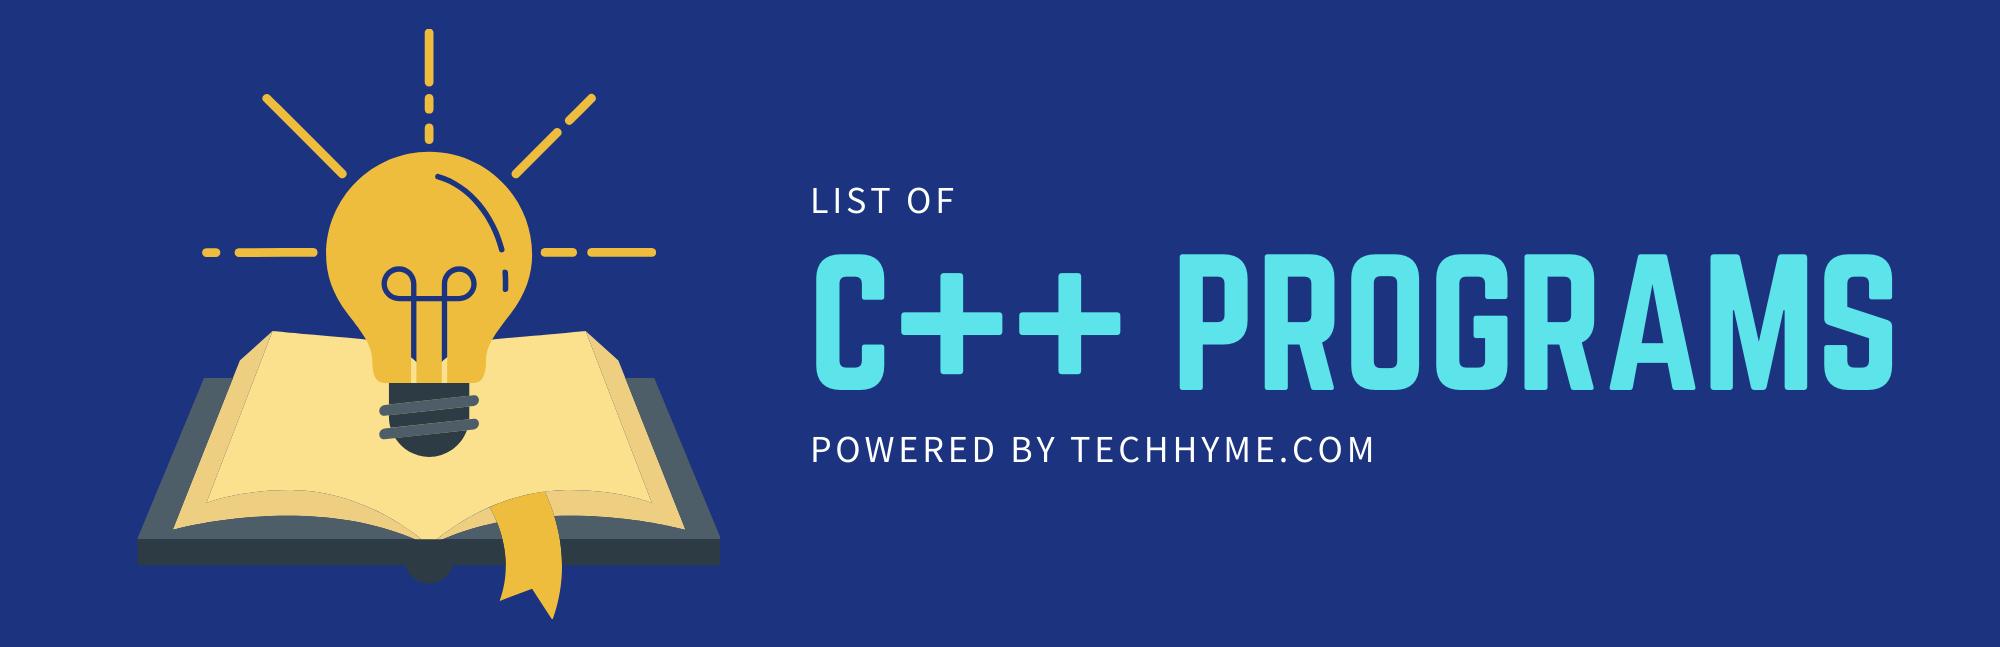 List of C++ programs techhyme